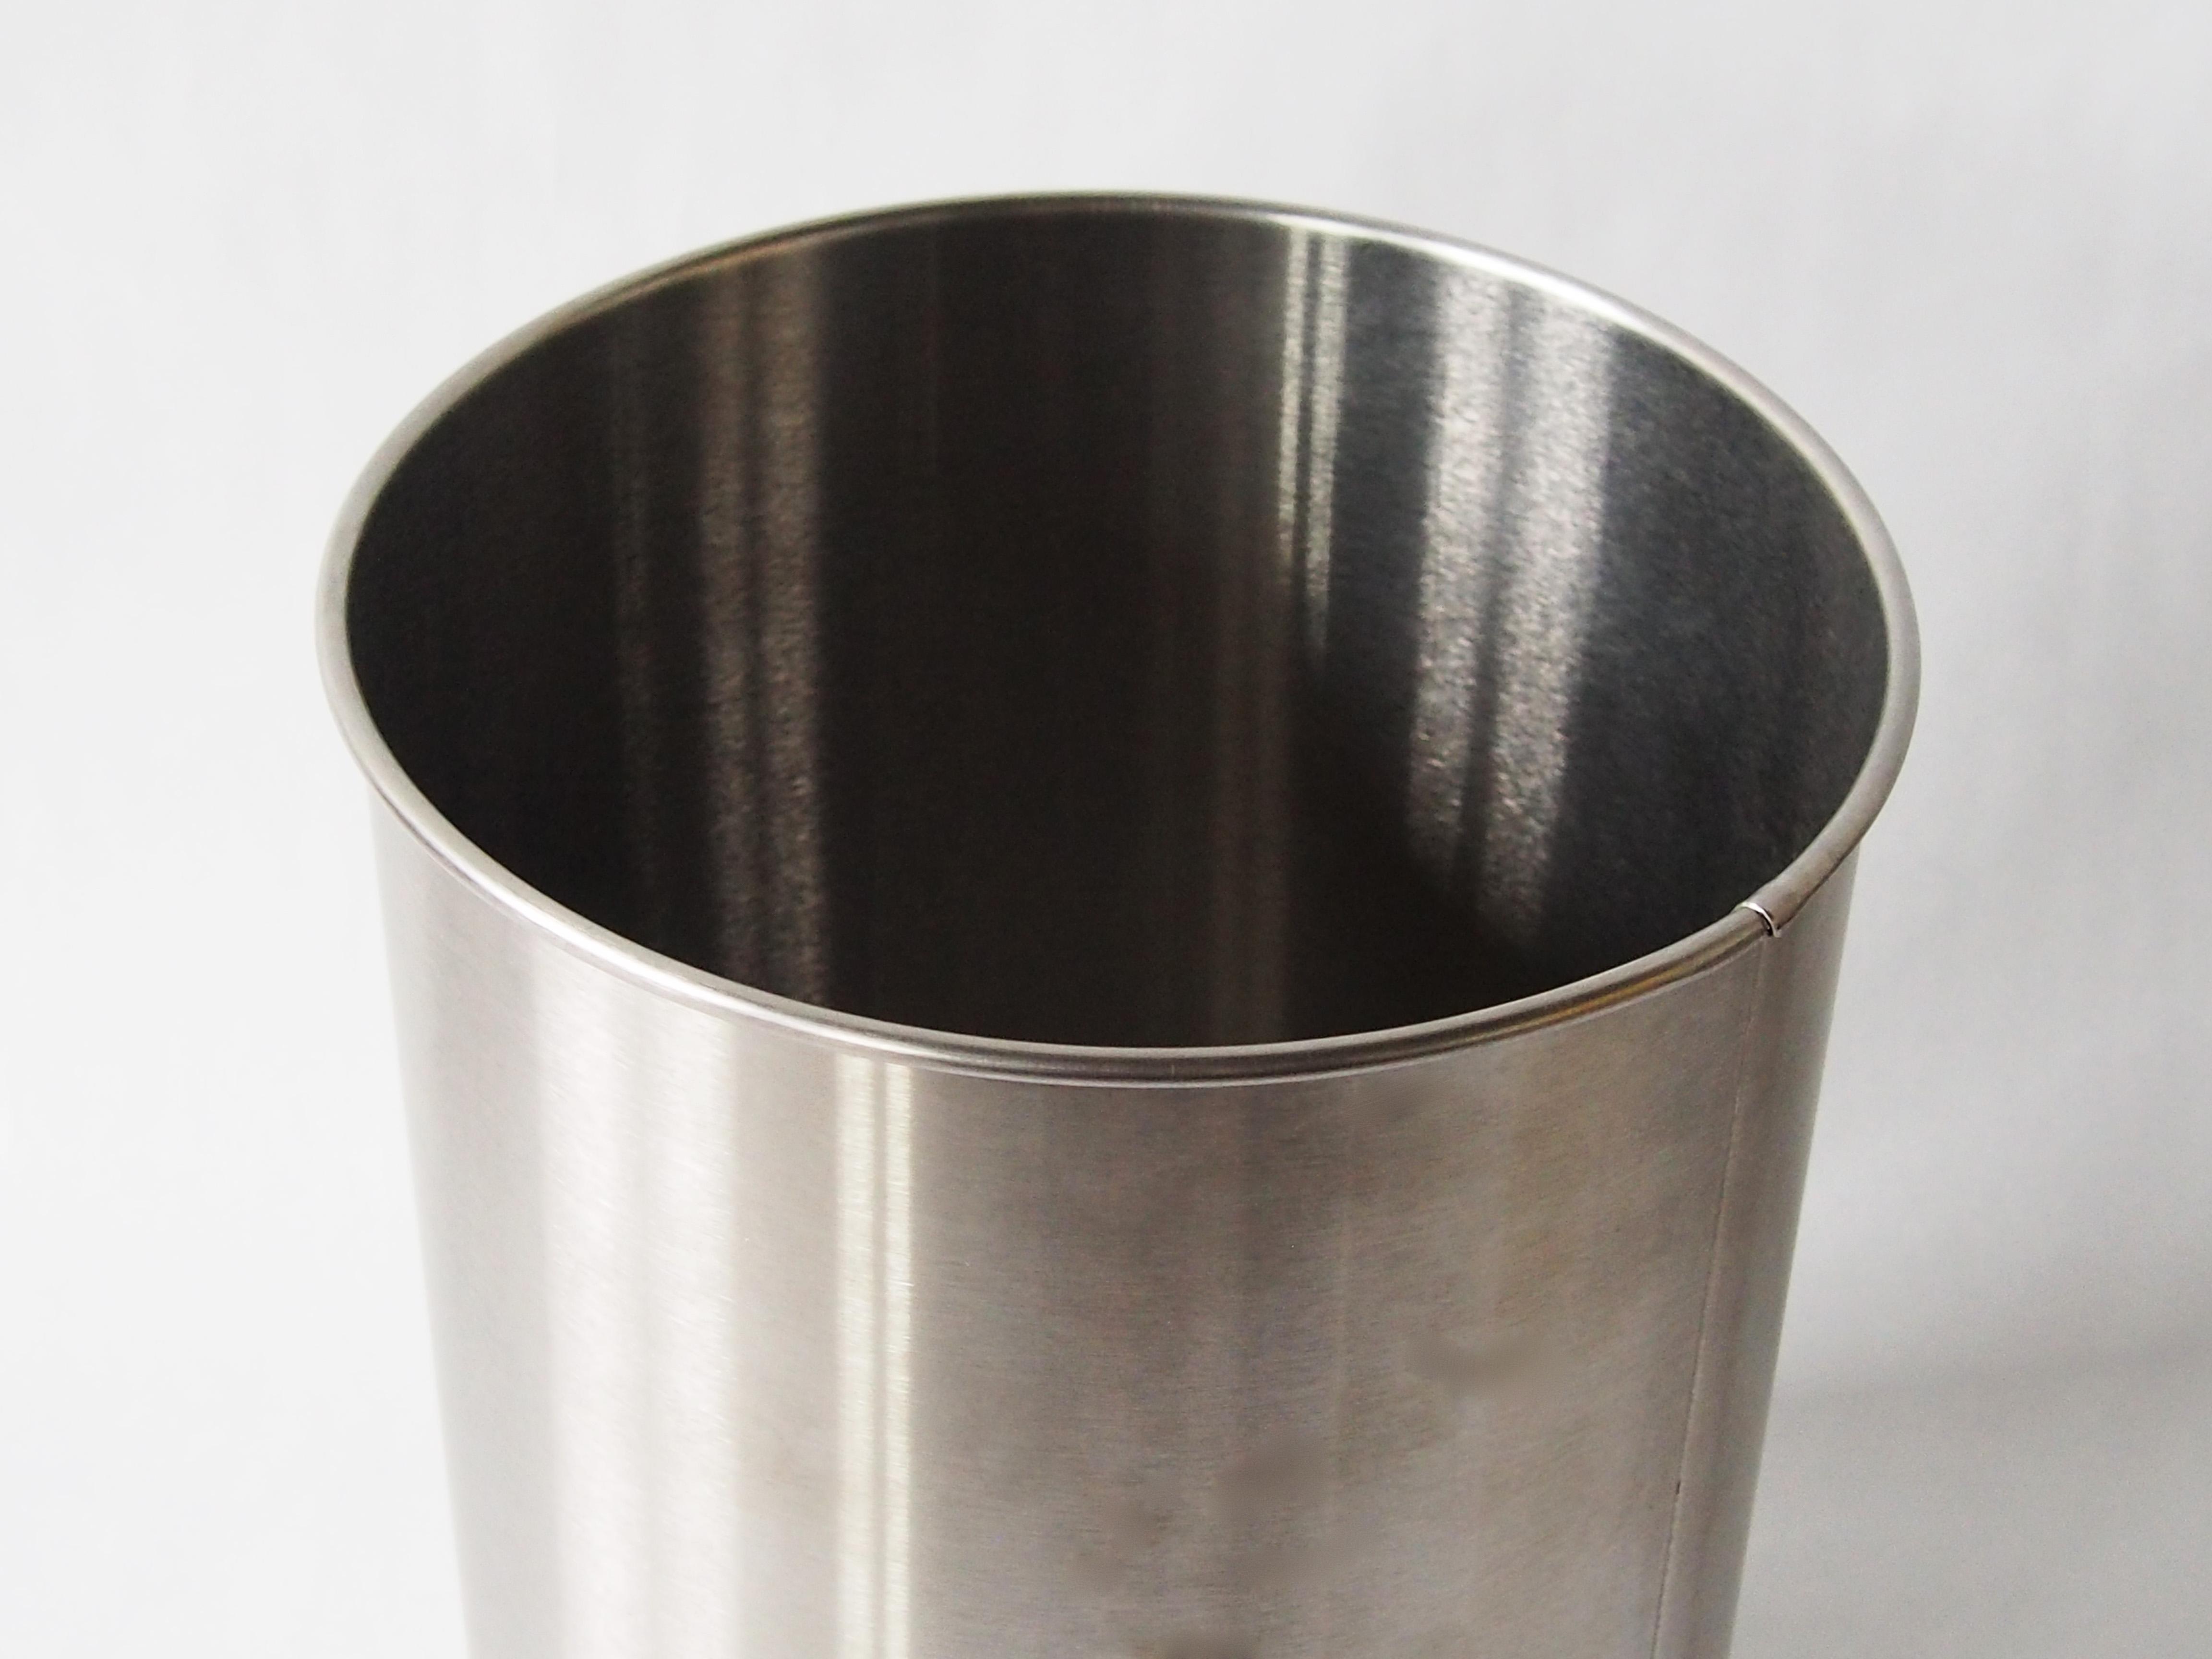 Brushed Stainless Steel Wastebasket Prestige Office